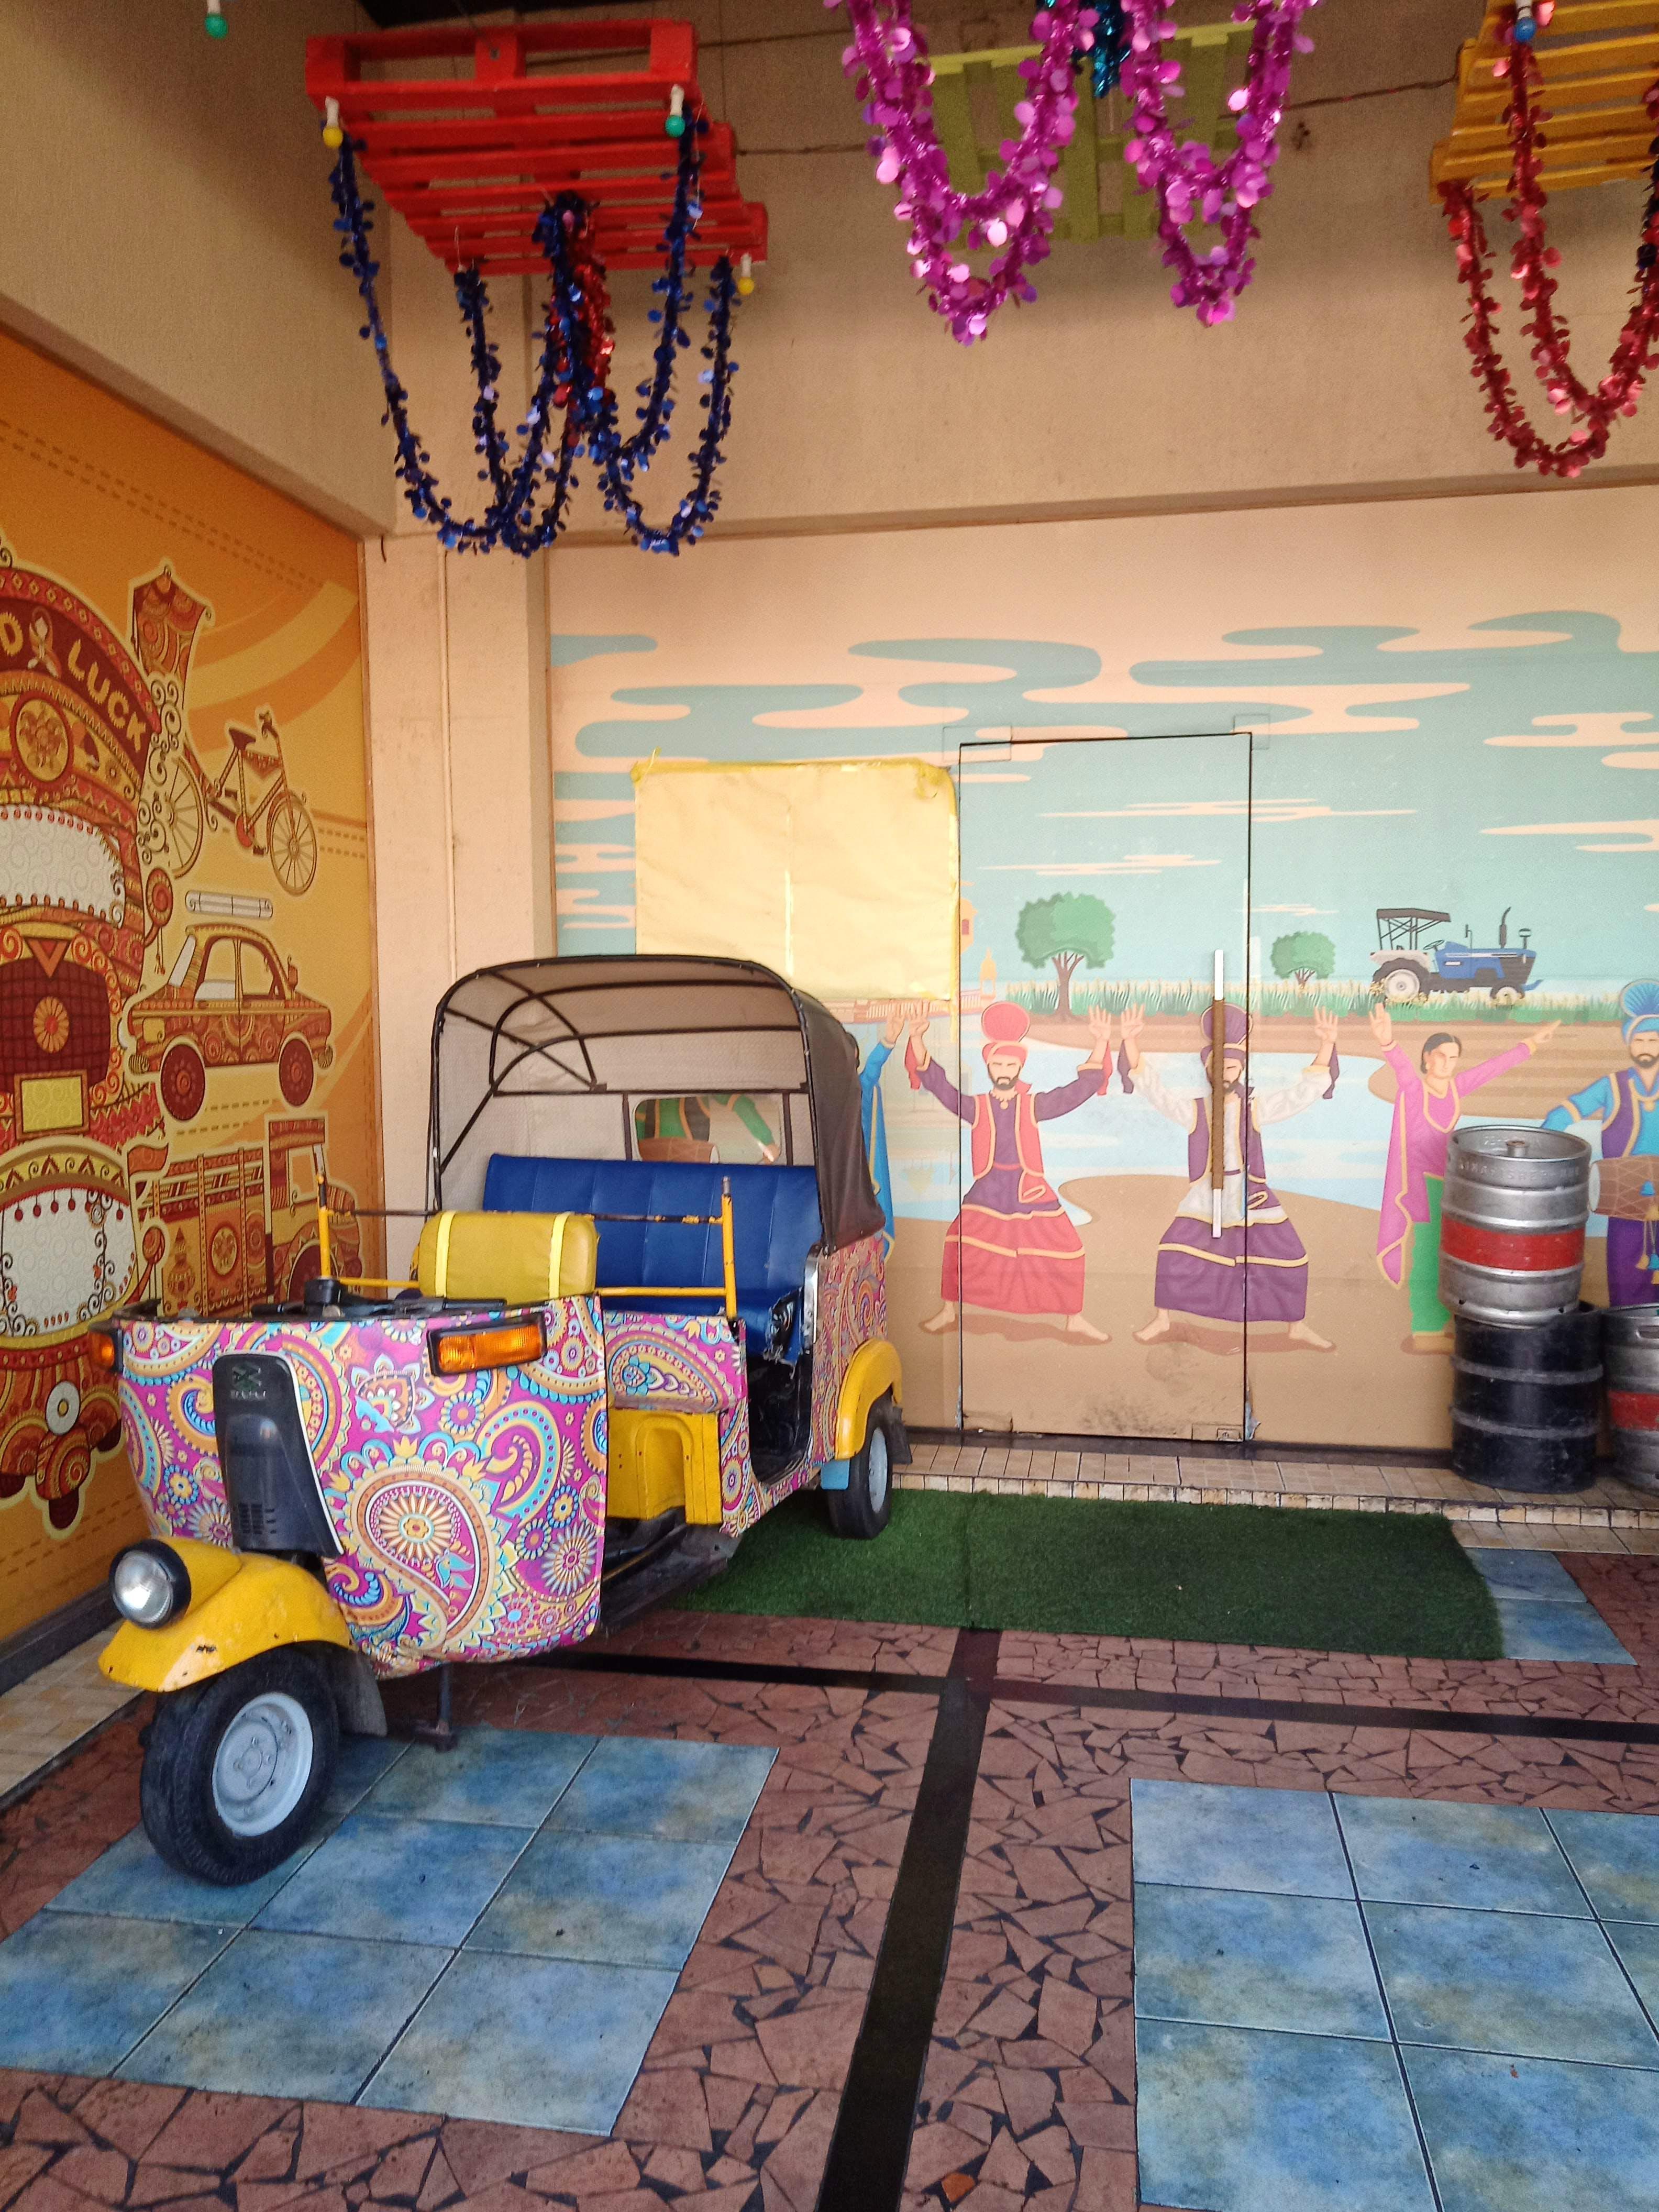 Mode of transport,Yellow,Transport,Wall,Vehicle,Automotive design,Car,Vacation,Art,Visual arts